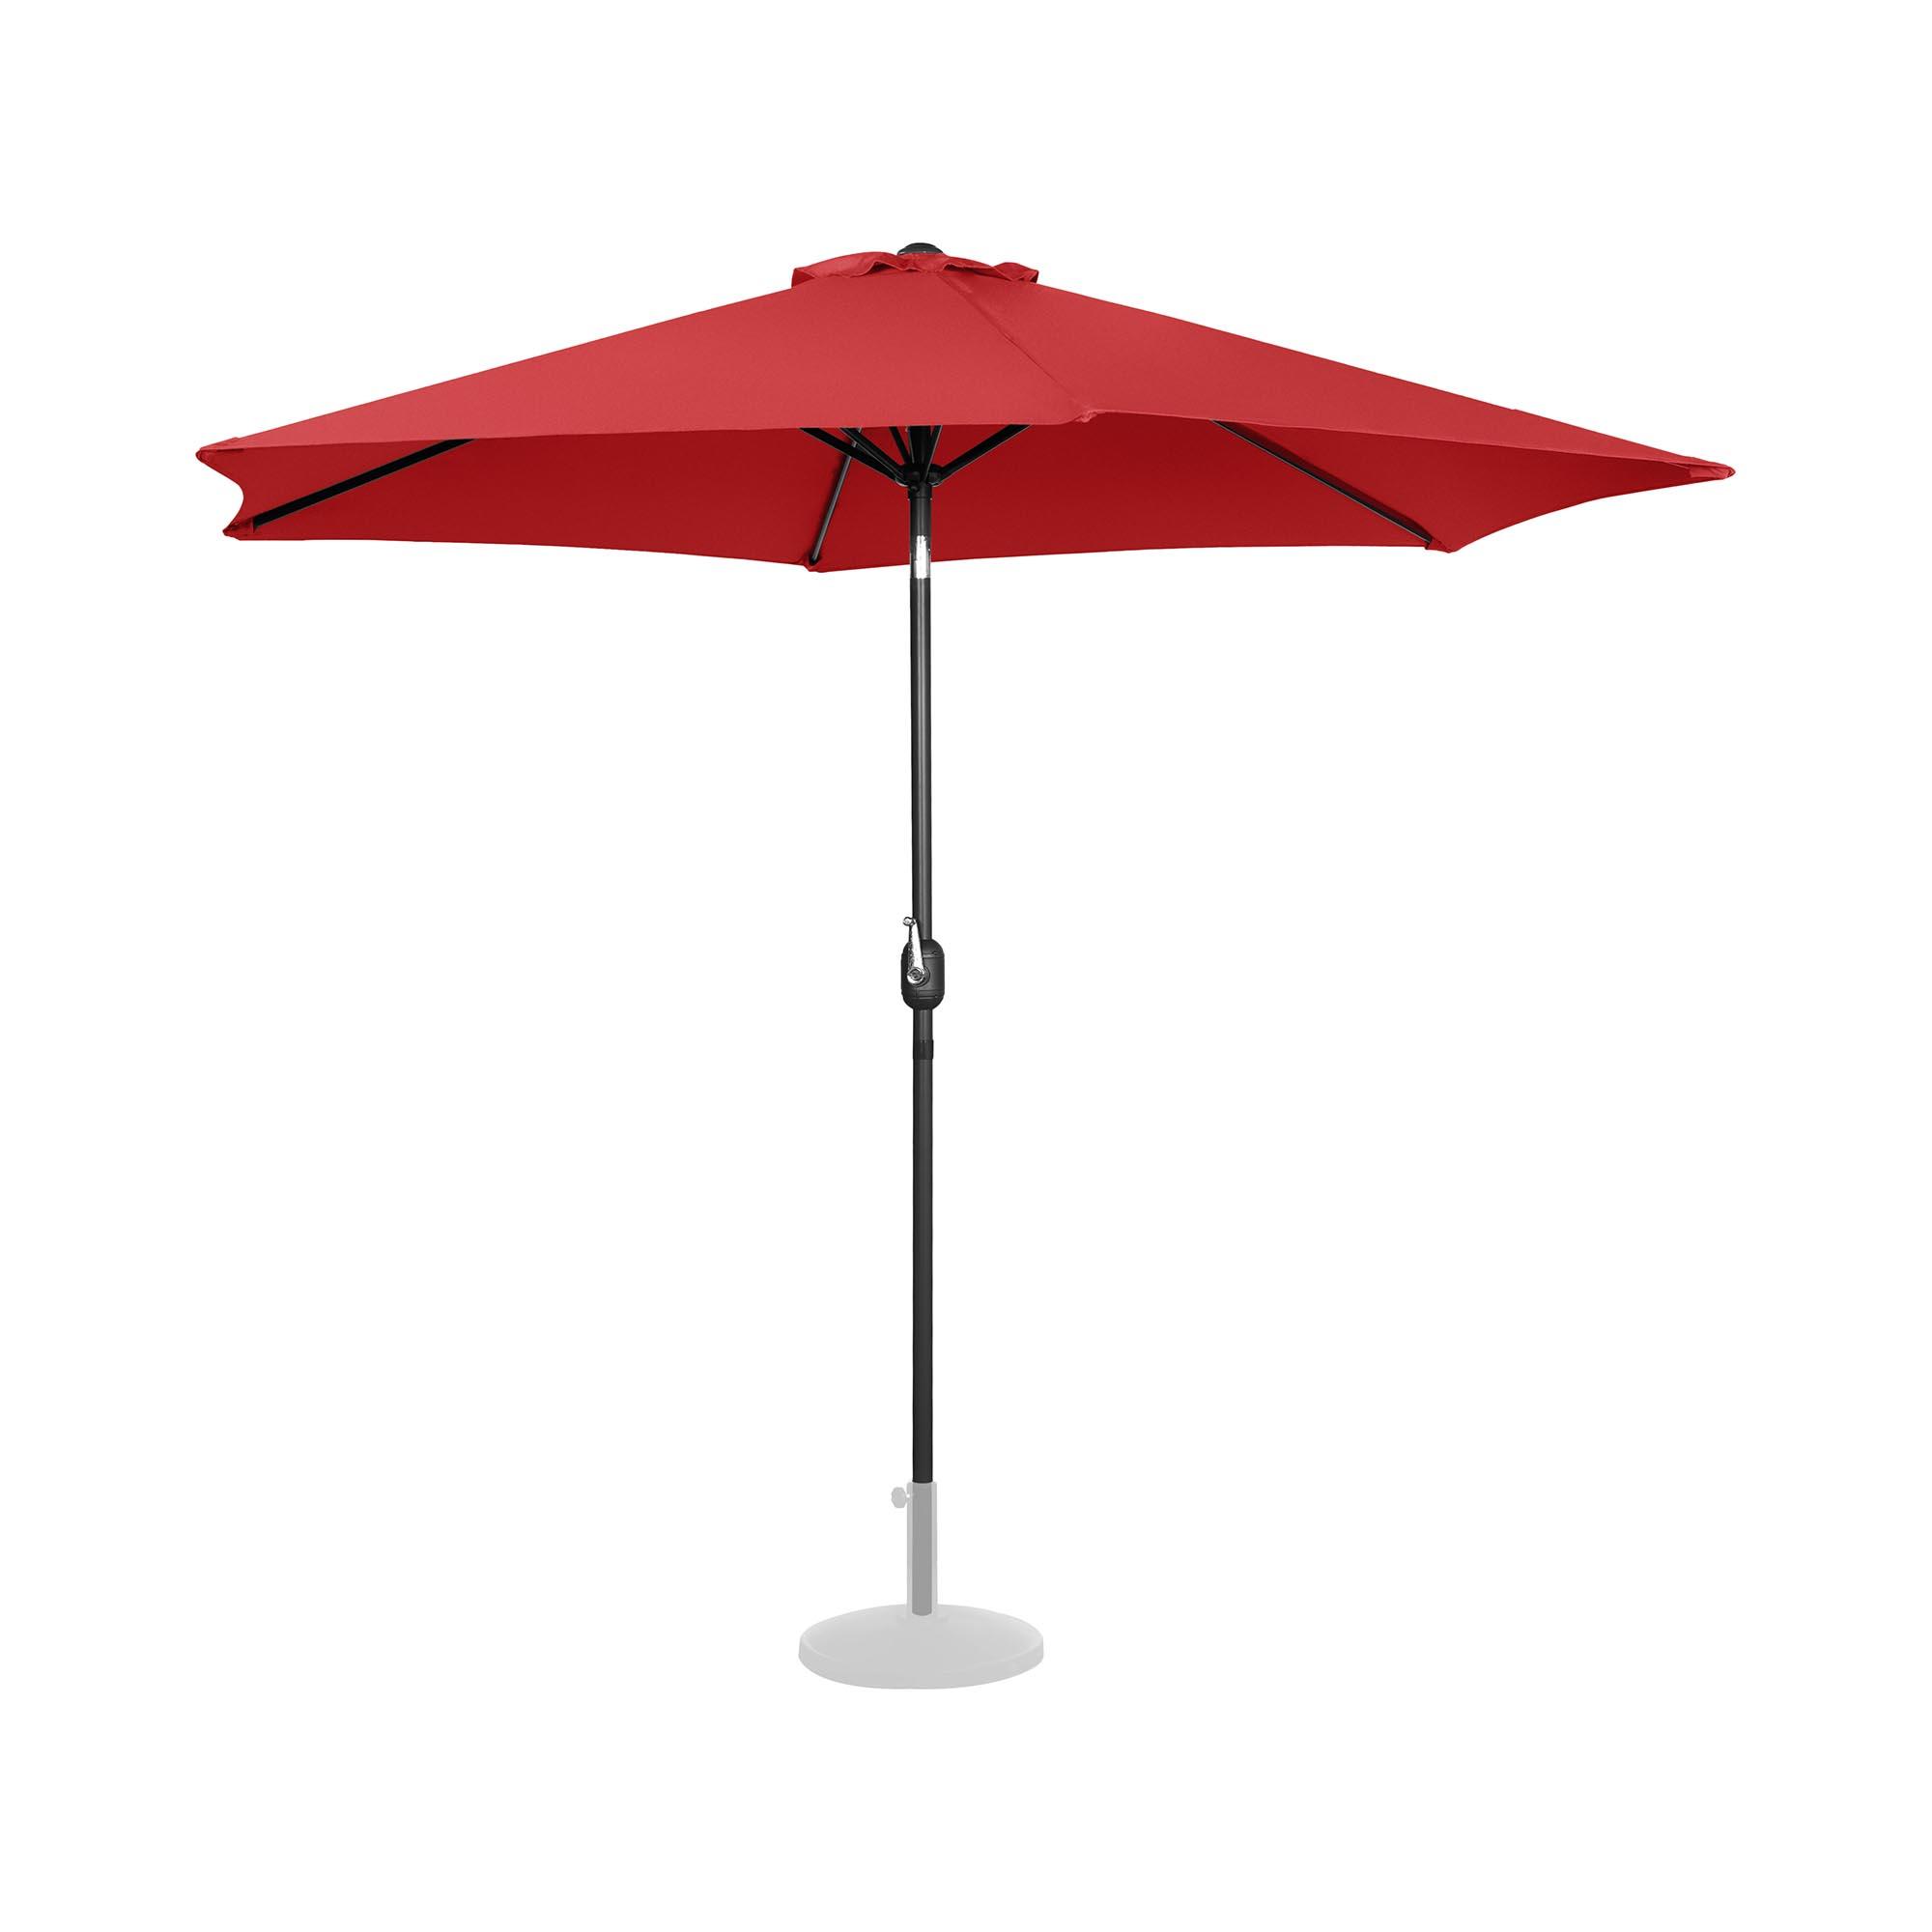 Uniprodo Sonnenschirm groß - rot - sechseckig - Ø 300 cm - neigbar UNI_UMBRELLA_TR300RE